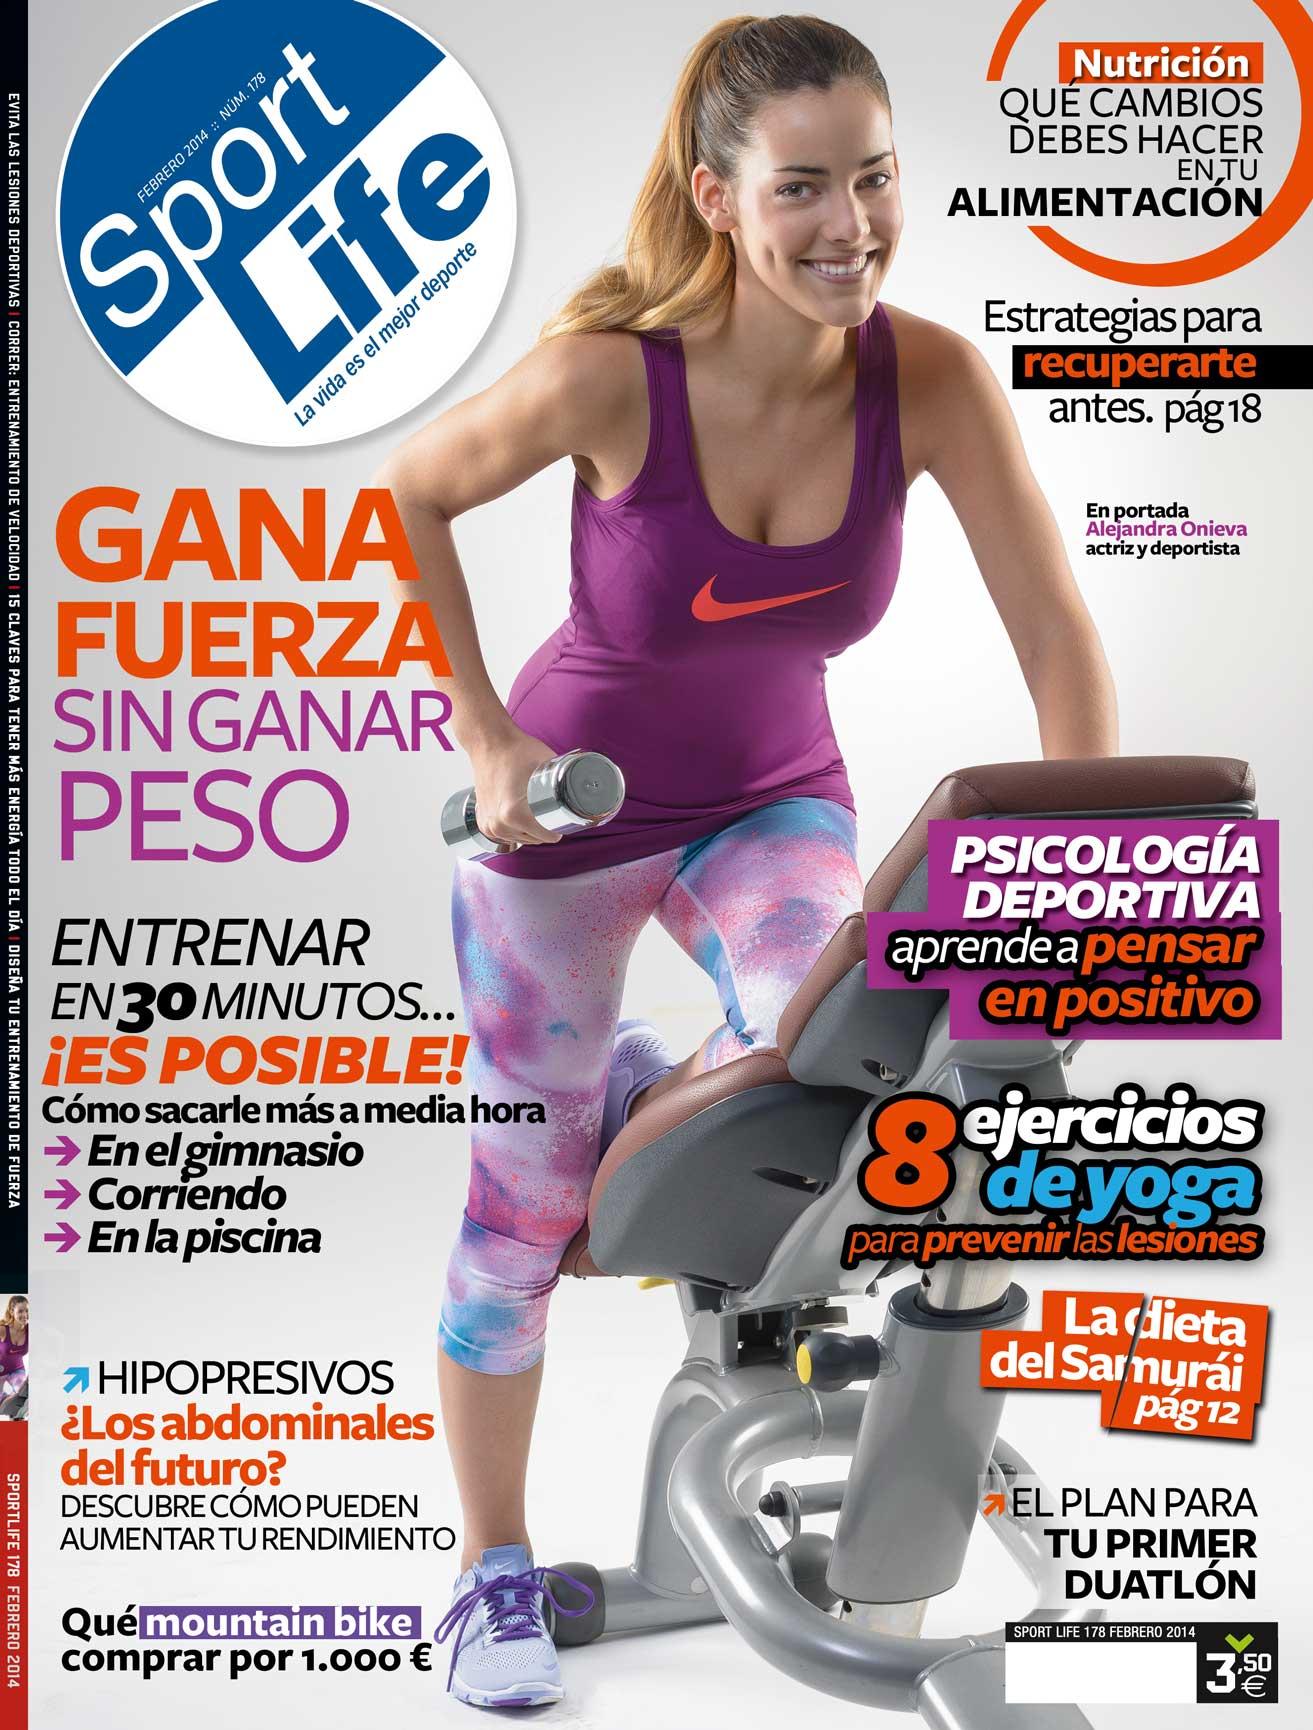 Sumario Sport Life 178 Febrero 2014